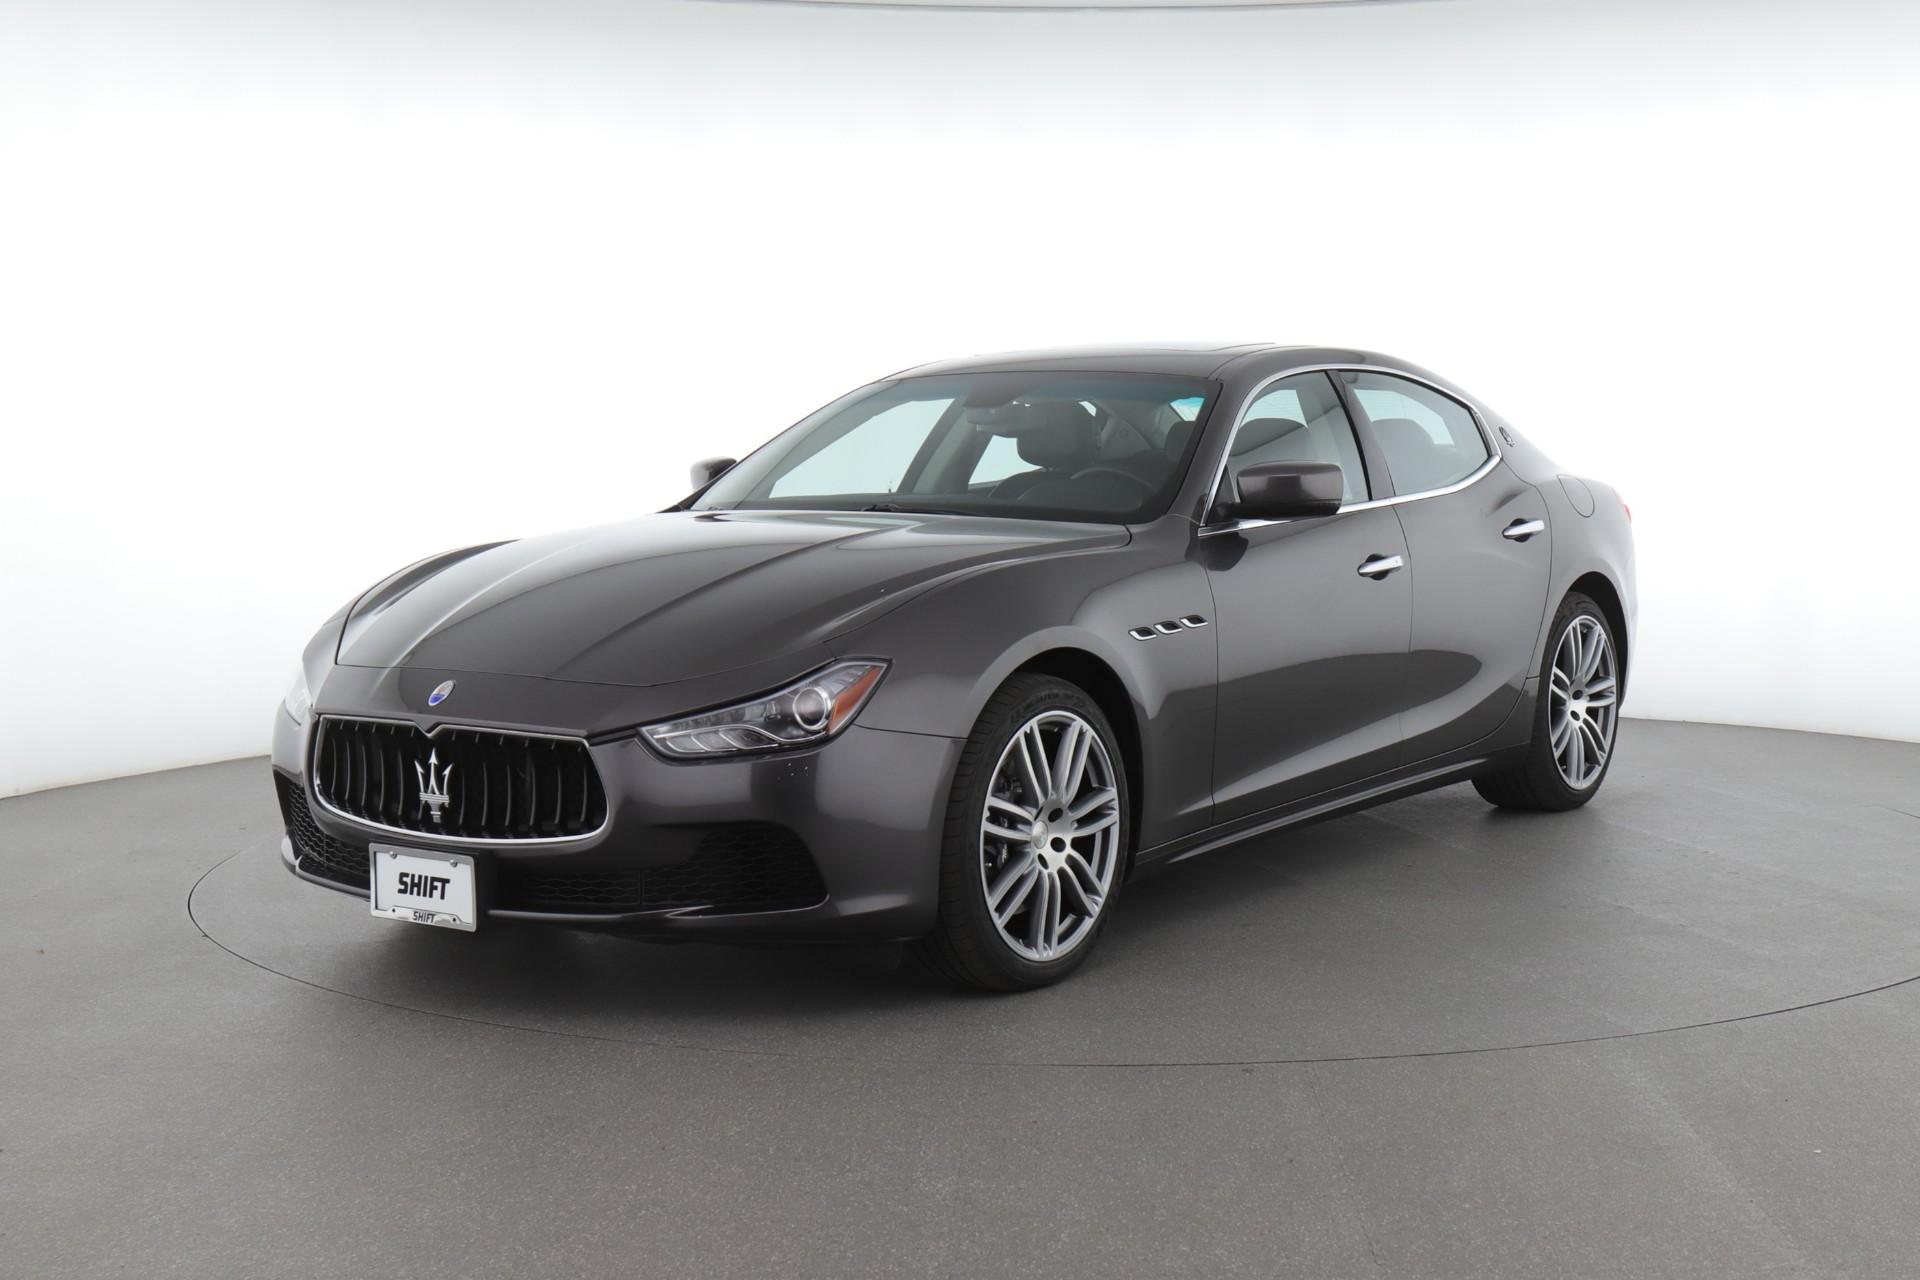 2015 Maserati Ghibli (from $28,450)